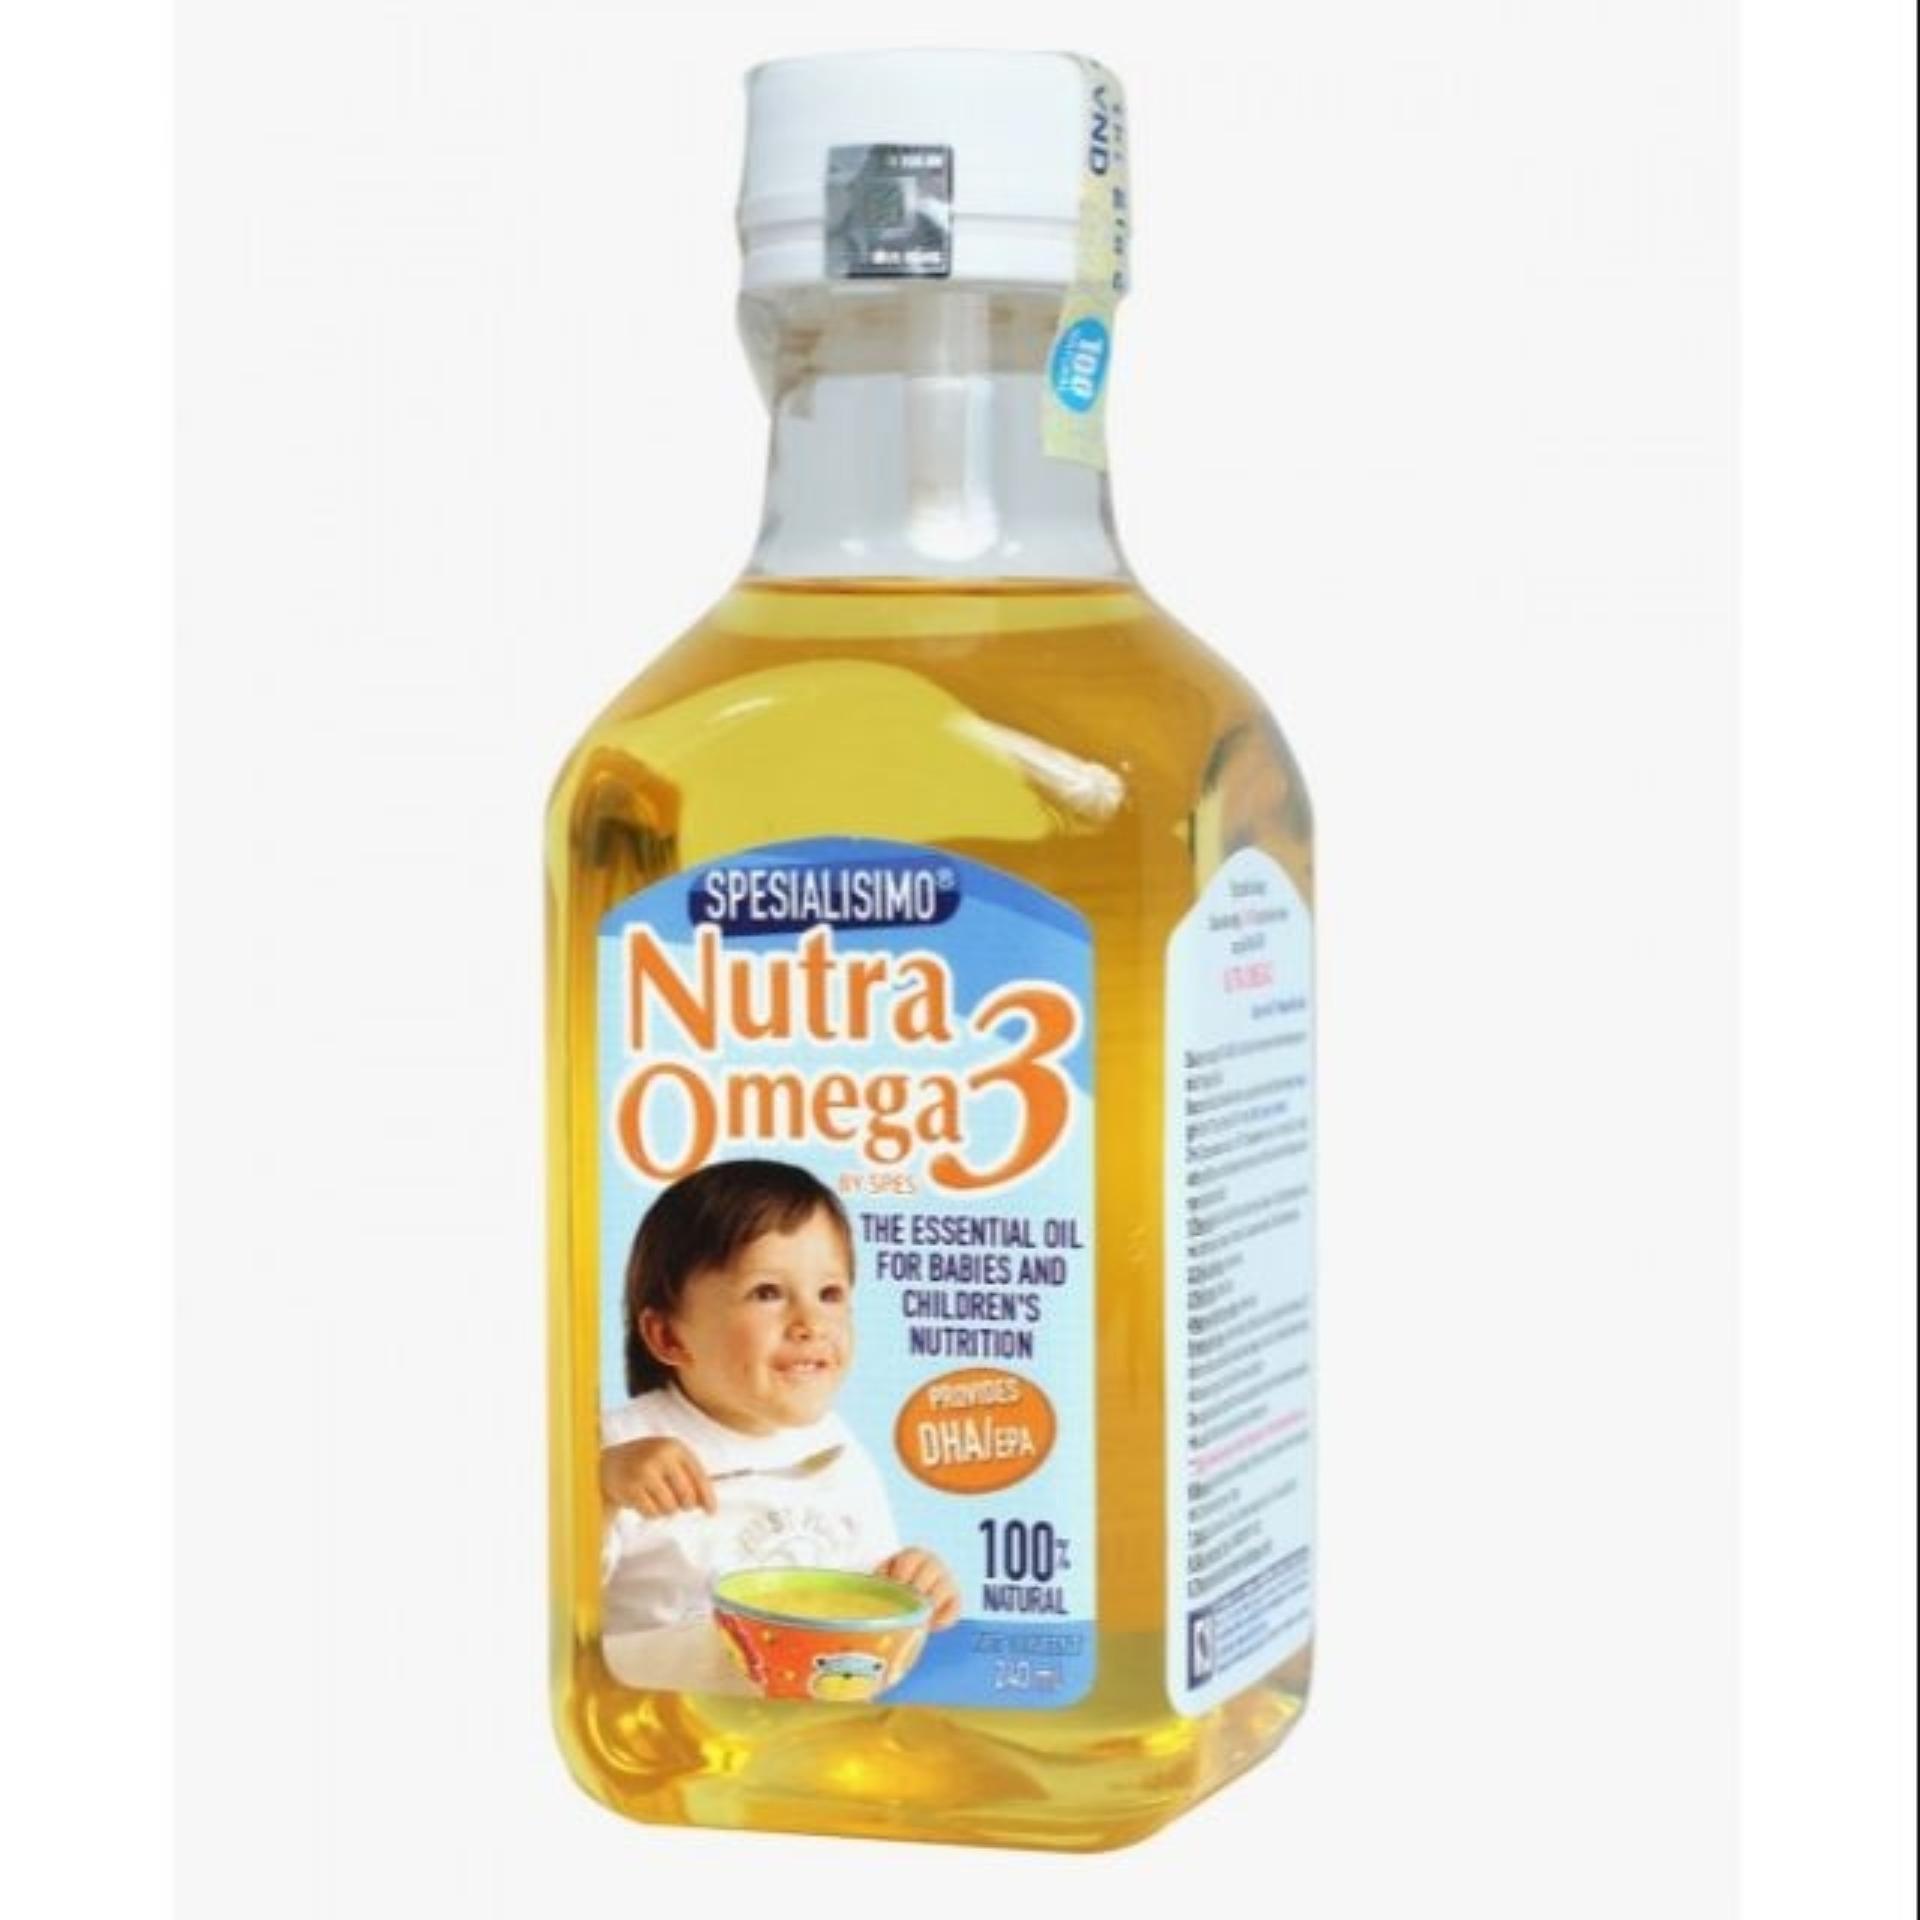 Mua Dầu Ca Hồi Nutra Omega3 Cho Trẻ Từ 7M Ăn Dặm 240Ml Nutra